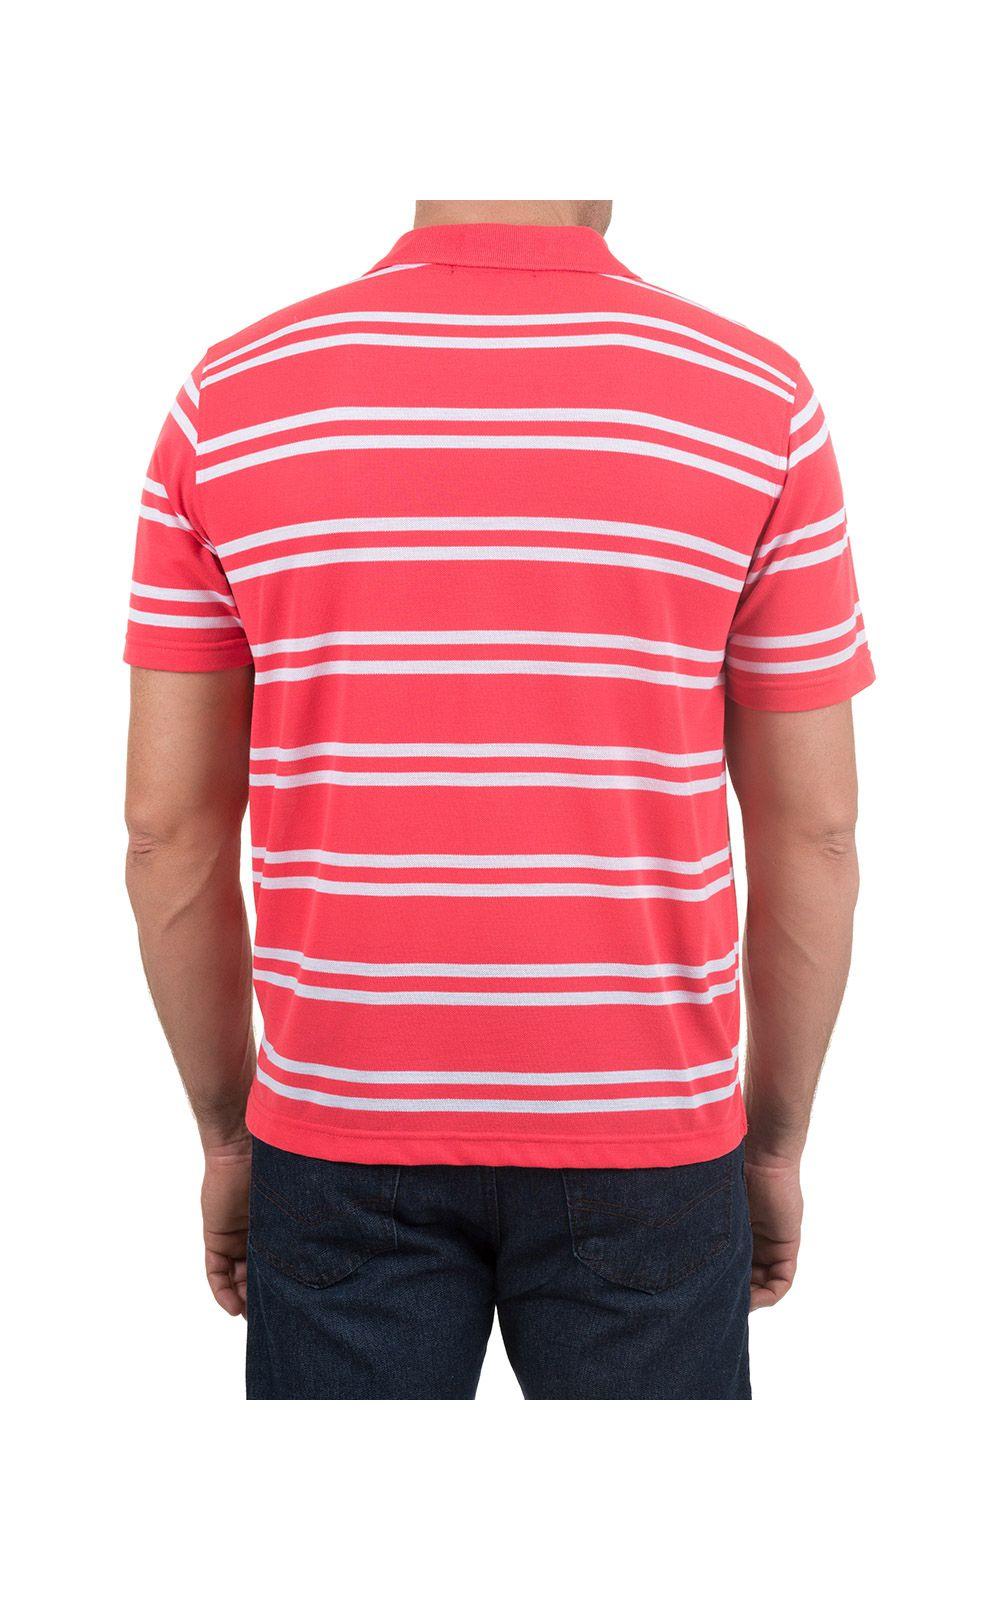 Foto 2 - Camisa Polo Masculina Rosa Listrada